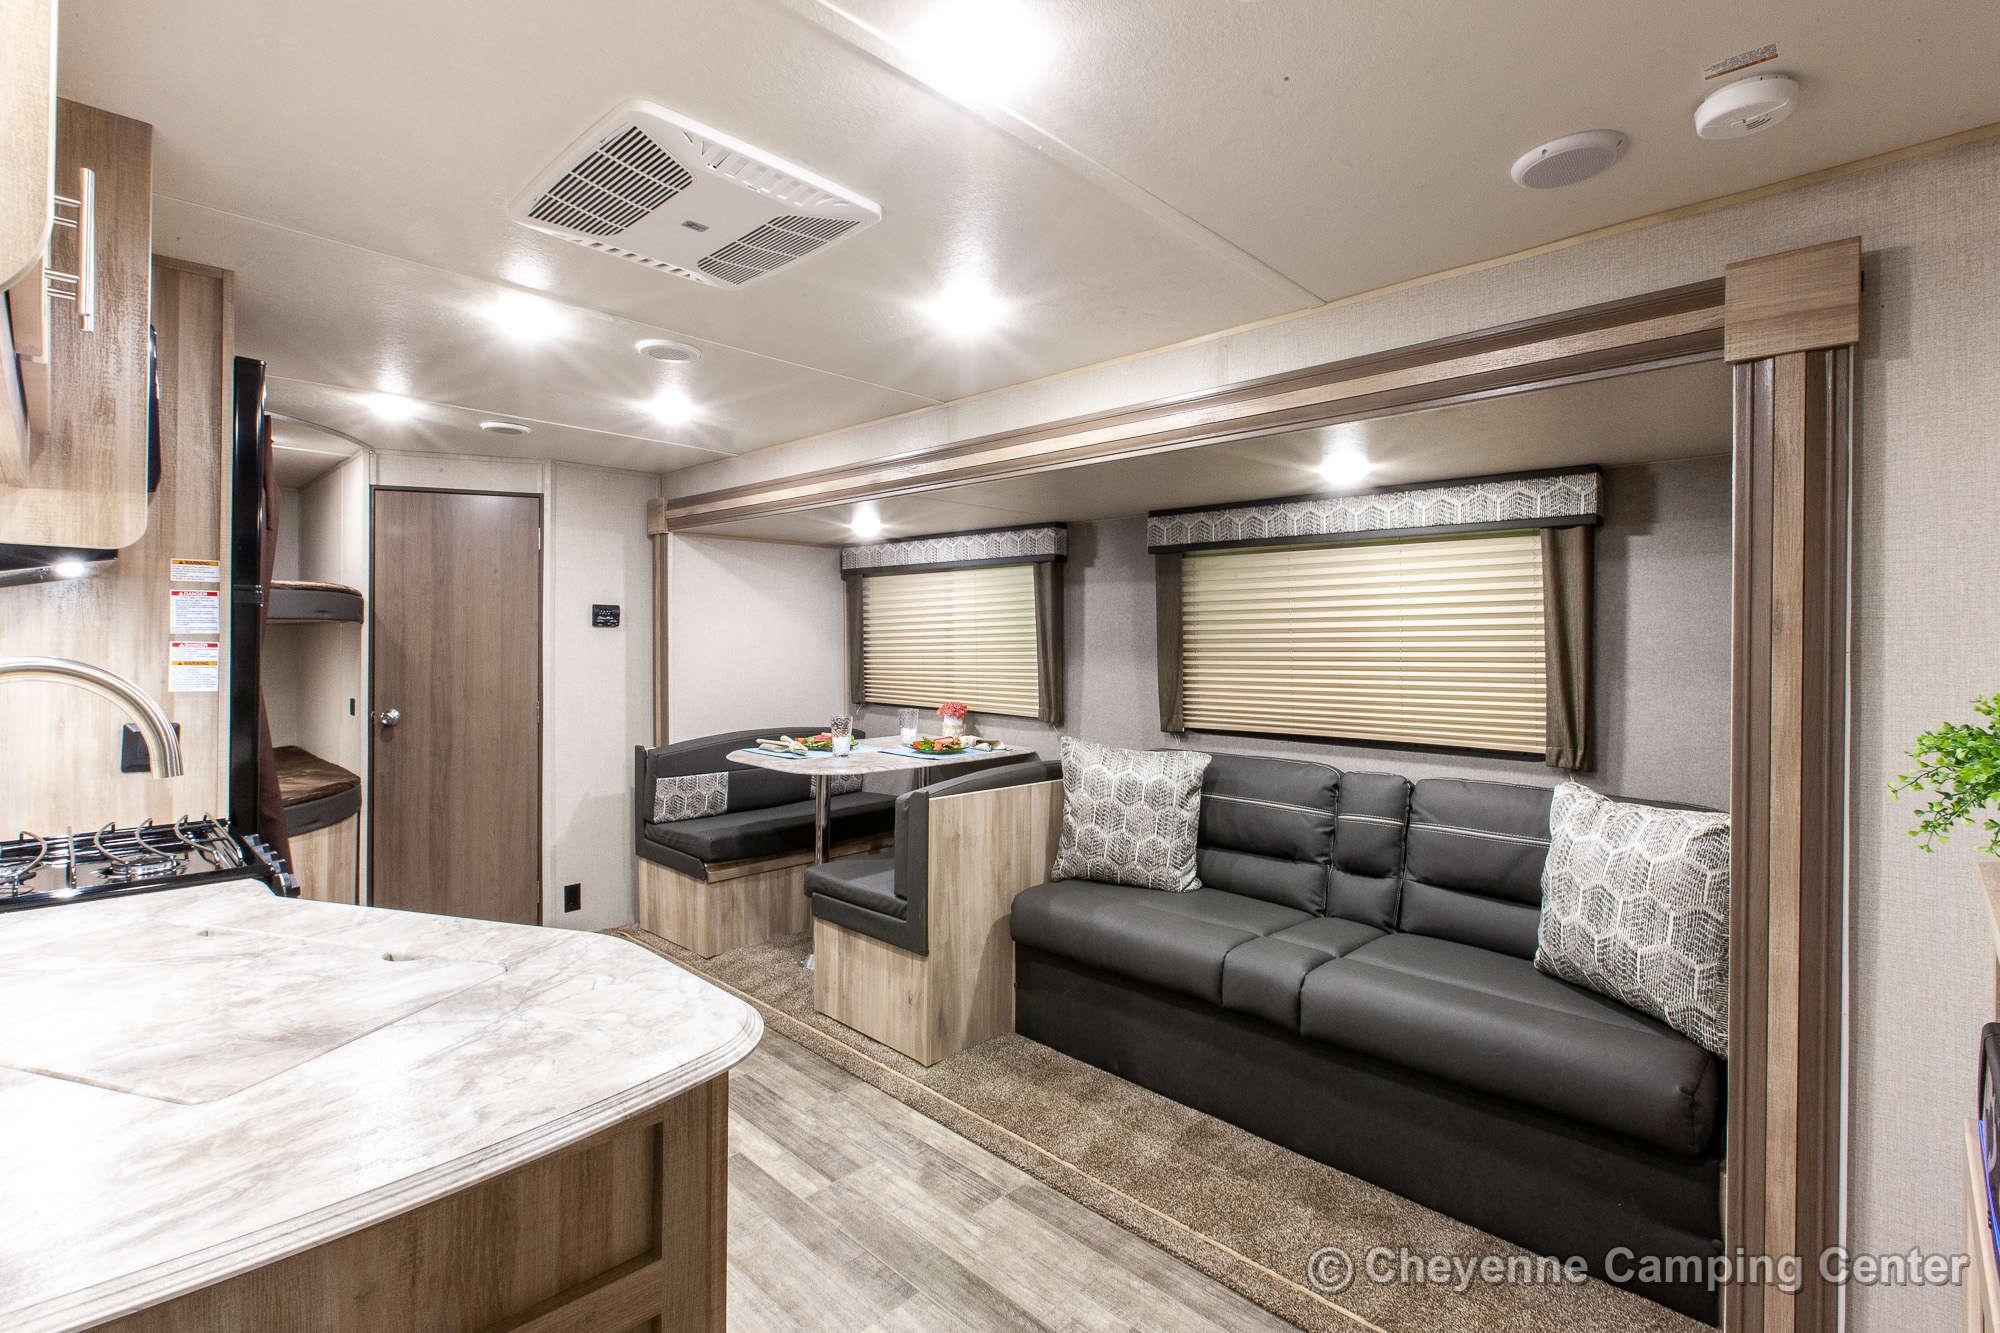 2022 Coachmen Catalina Summit Series 261BHS Bunkhouse Travel Trailer Interior Image